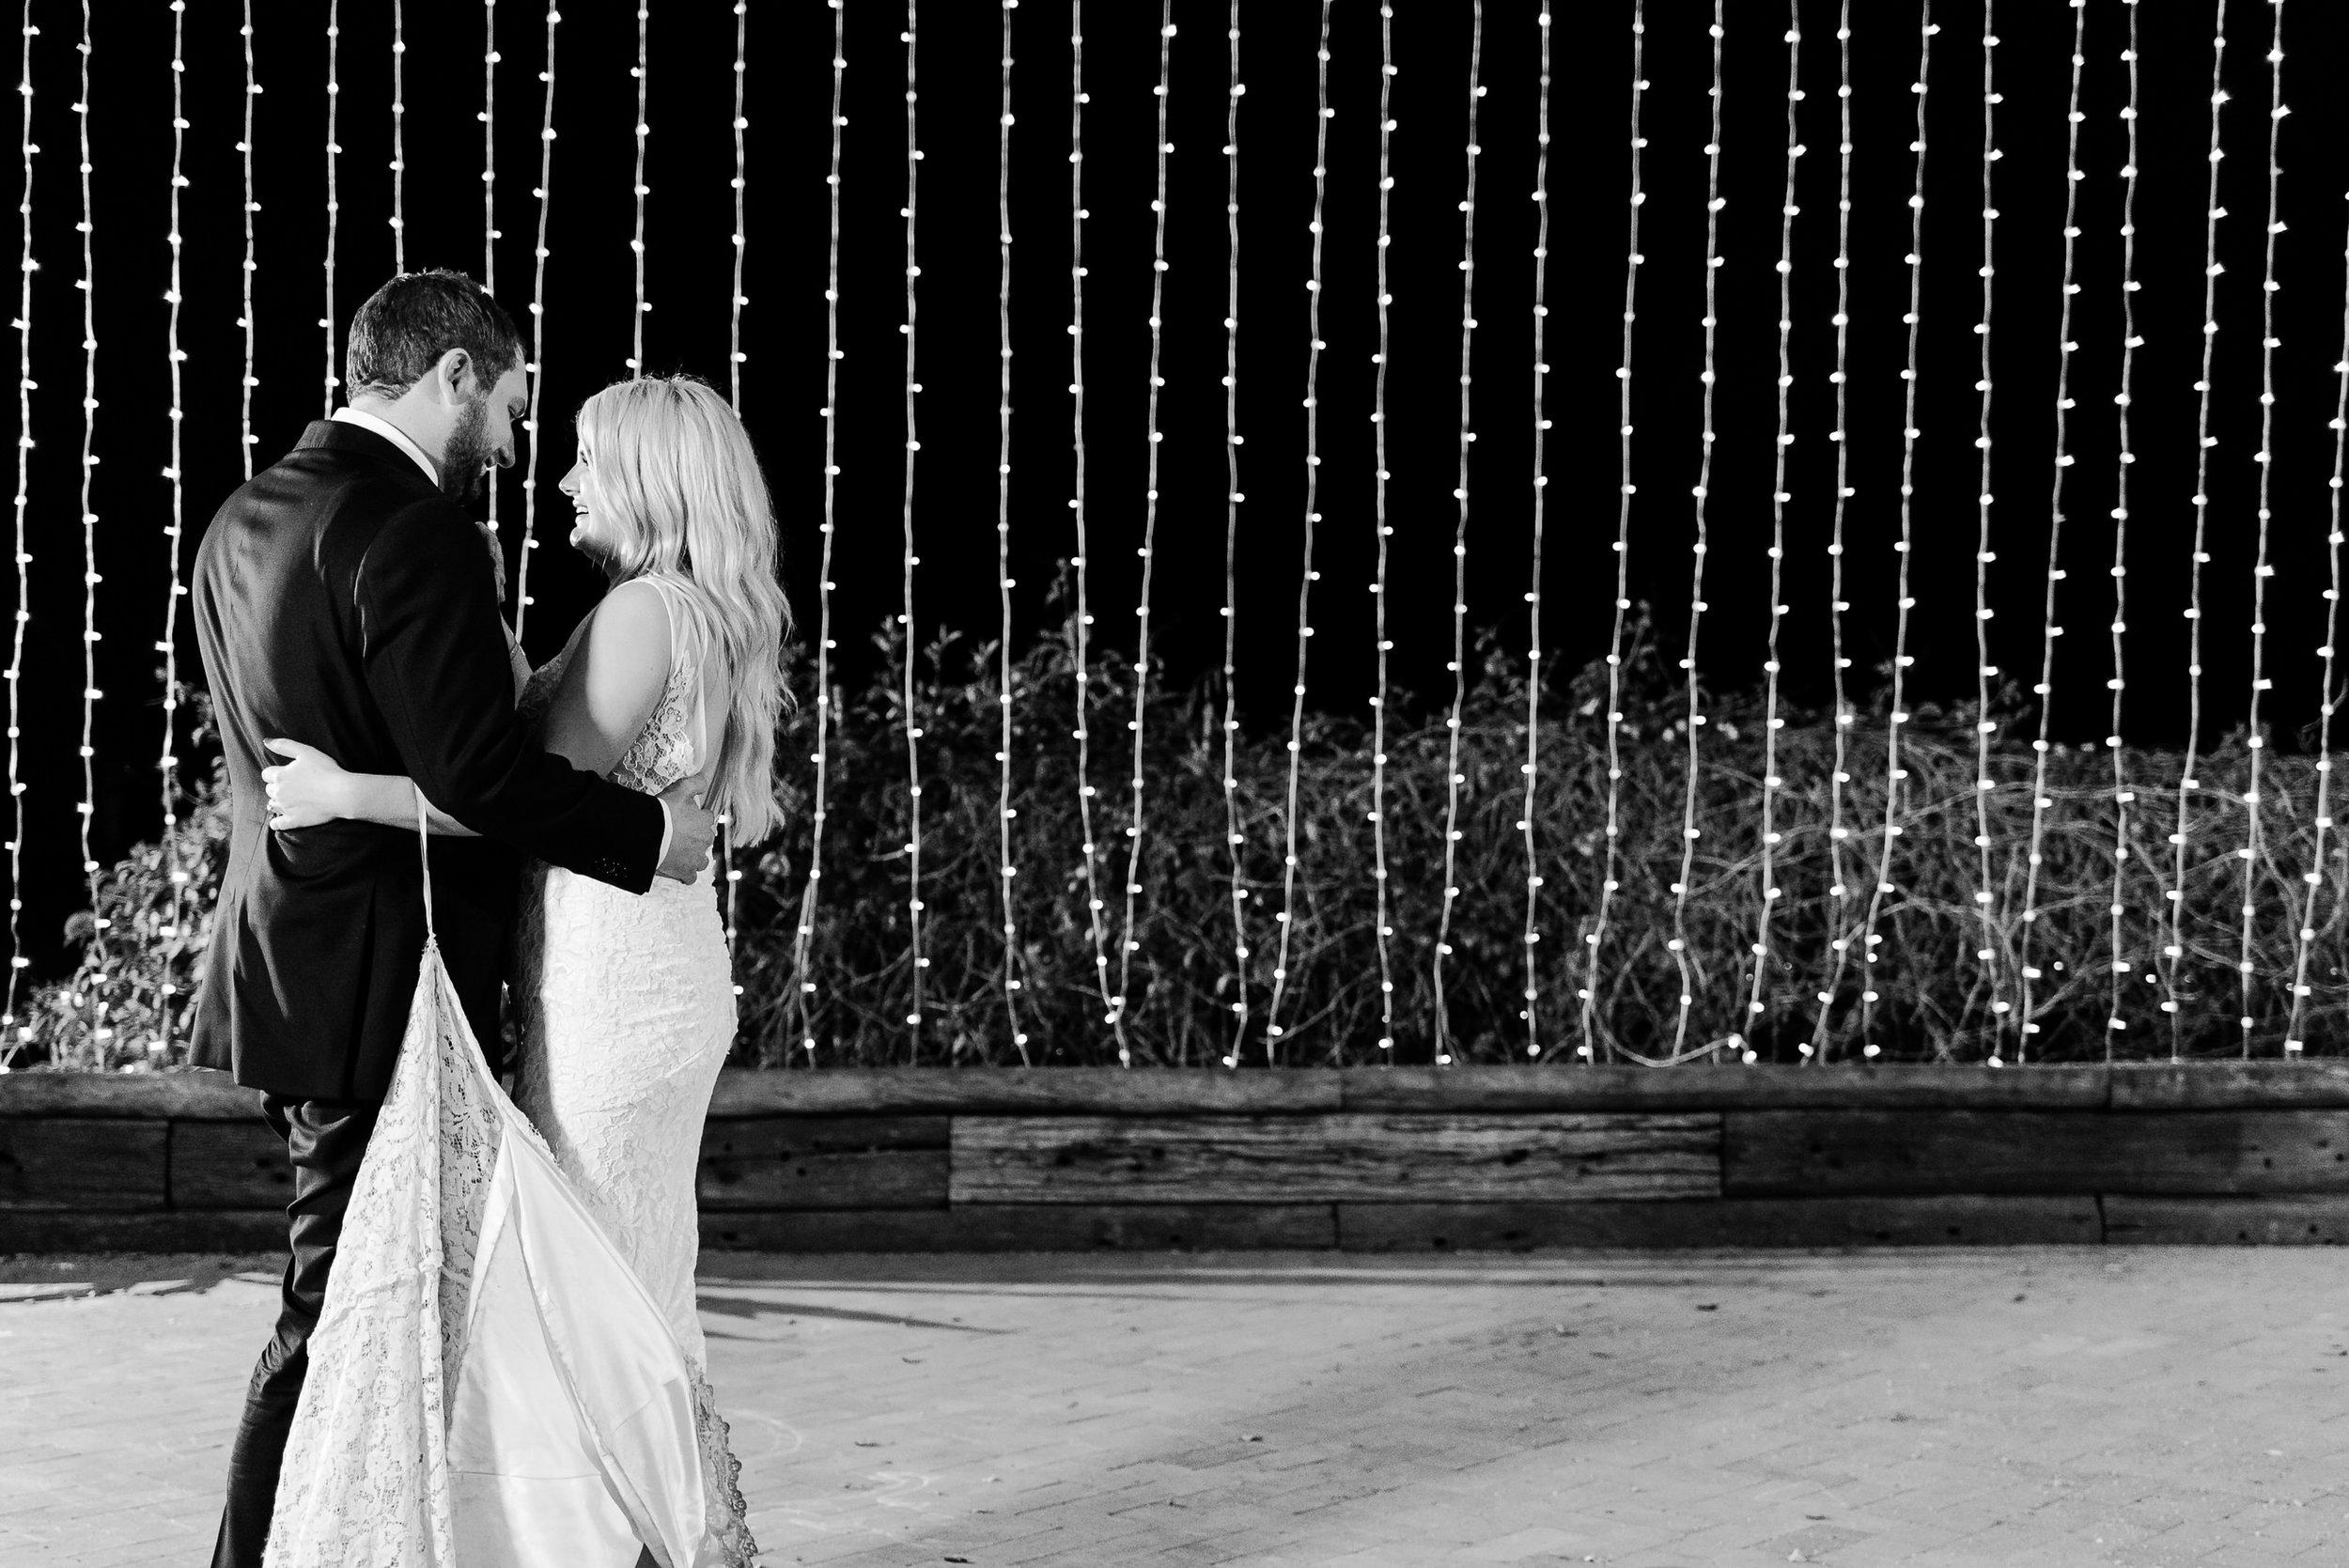 Justin_And_Jim_Photography_Byron_Bay_Wedding110.JPG